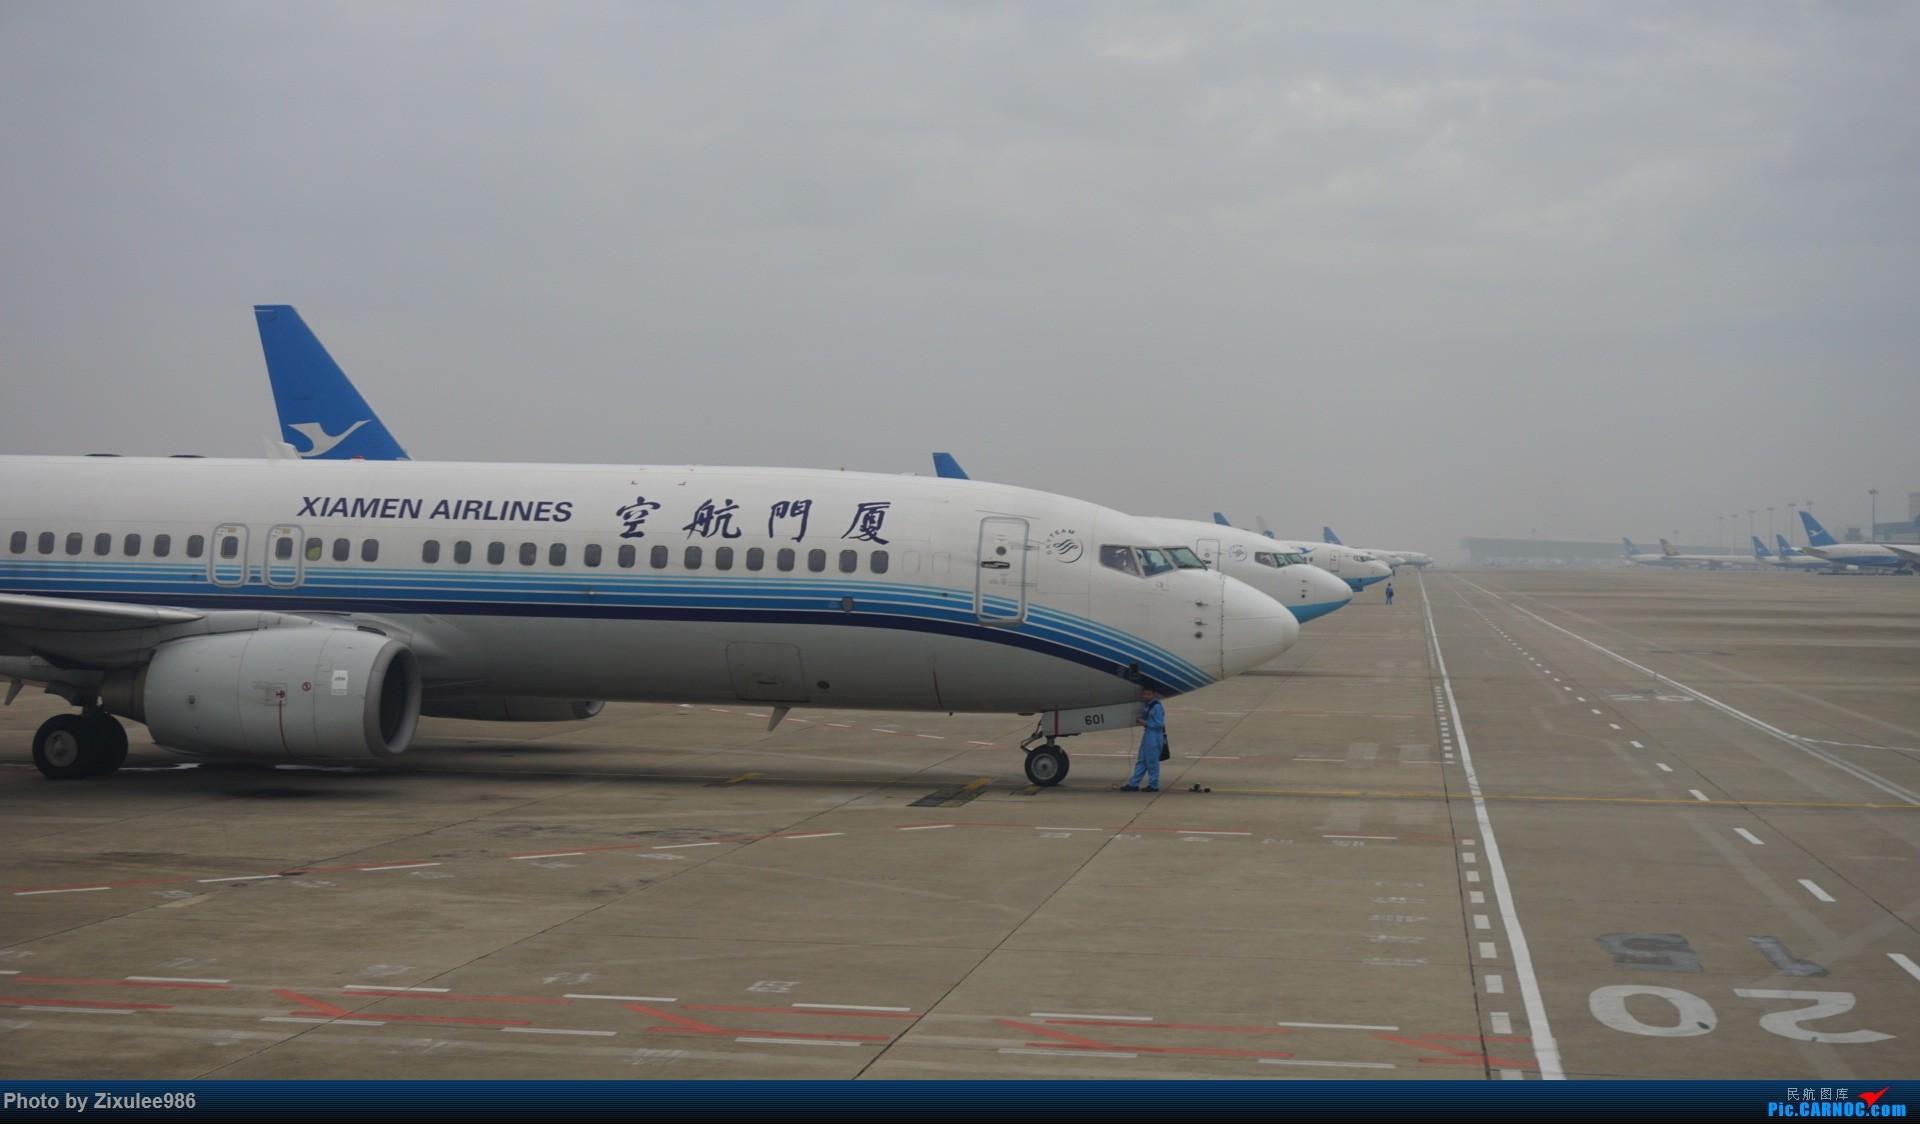 Re:[原创][XMN]寒假东北游随拍PART1--厦航篇~头一次拍752 BOEING 737-85C(WL) B-5601 中国厦门高崎国际机场